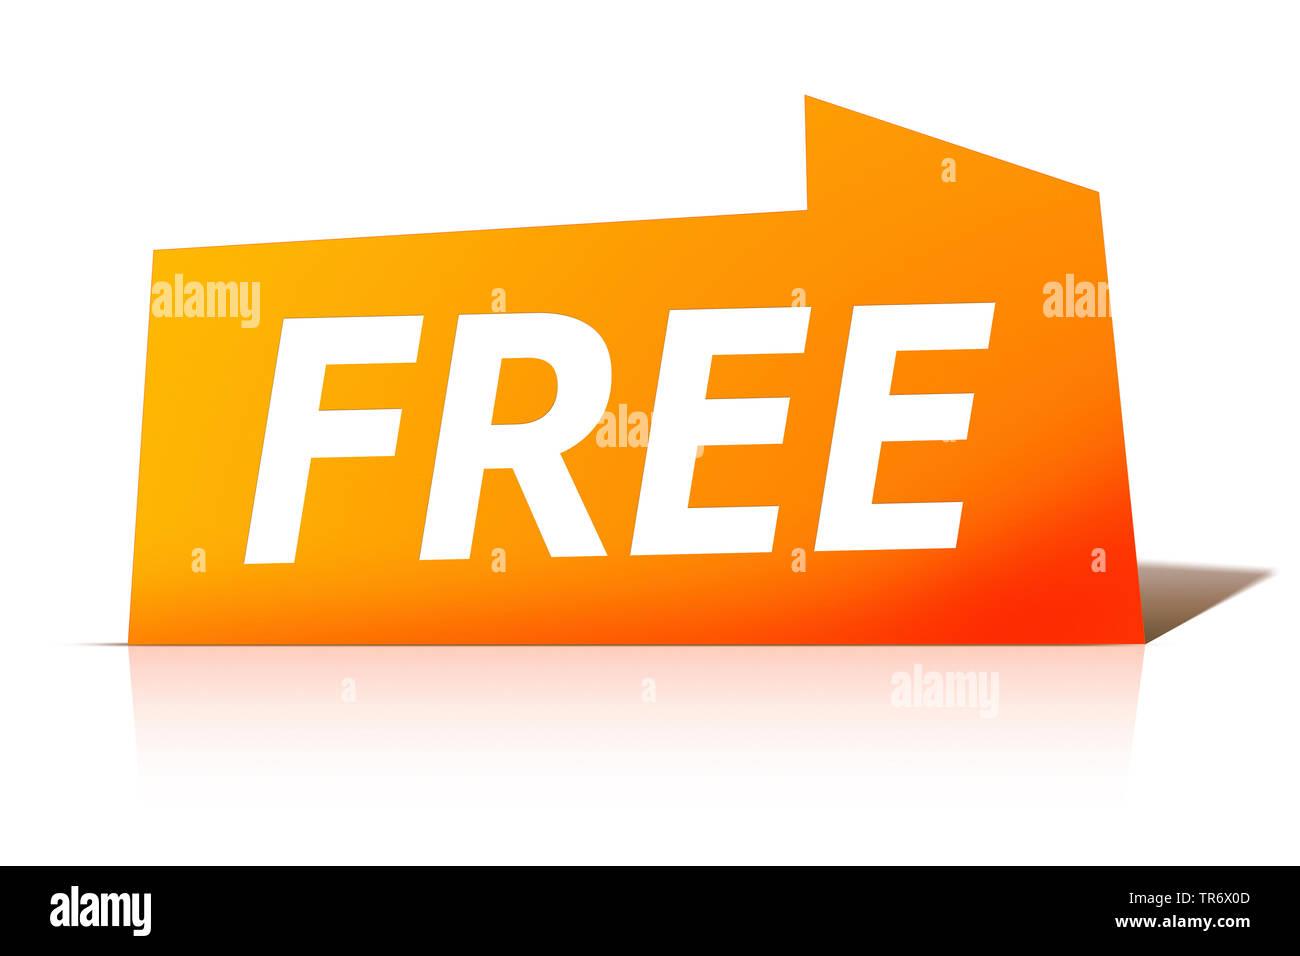 3D Computergrafik, orange Sprechblase mit Text FREE, Europa | 3D computer graphic, orange speech bubble reading FREE, Europe | BLWS491623.jpg [ (c) bl - Stock Image